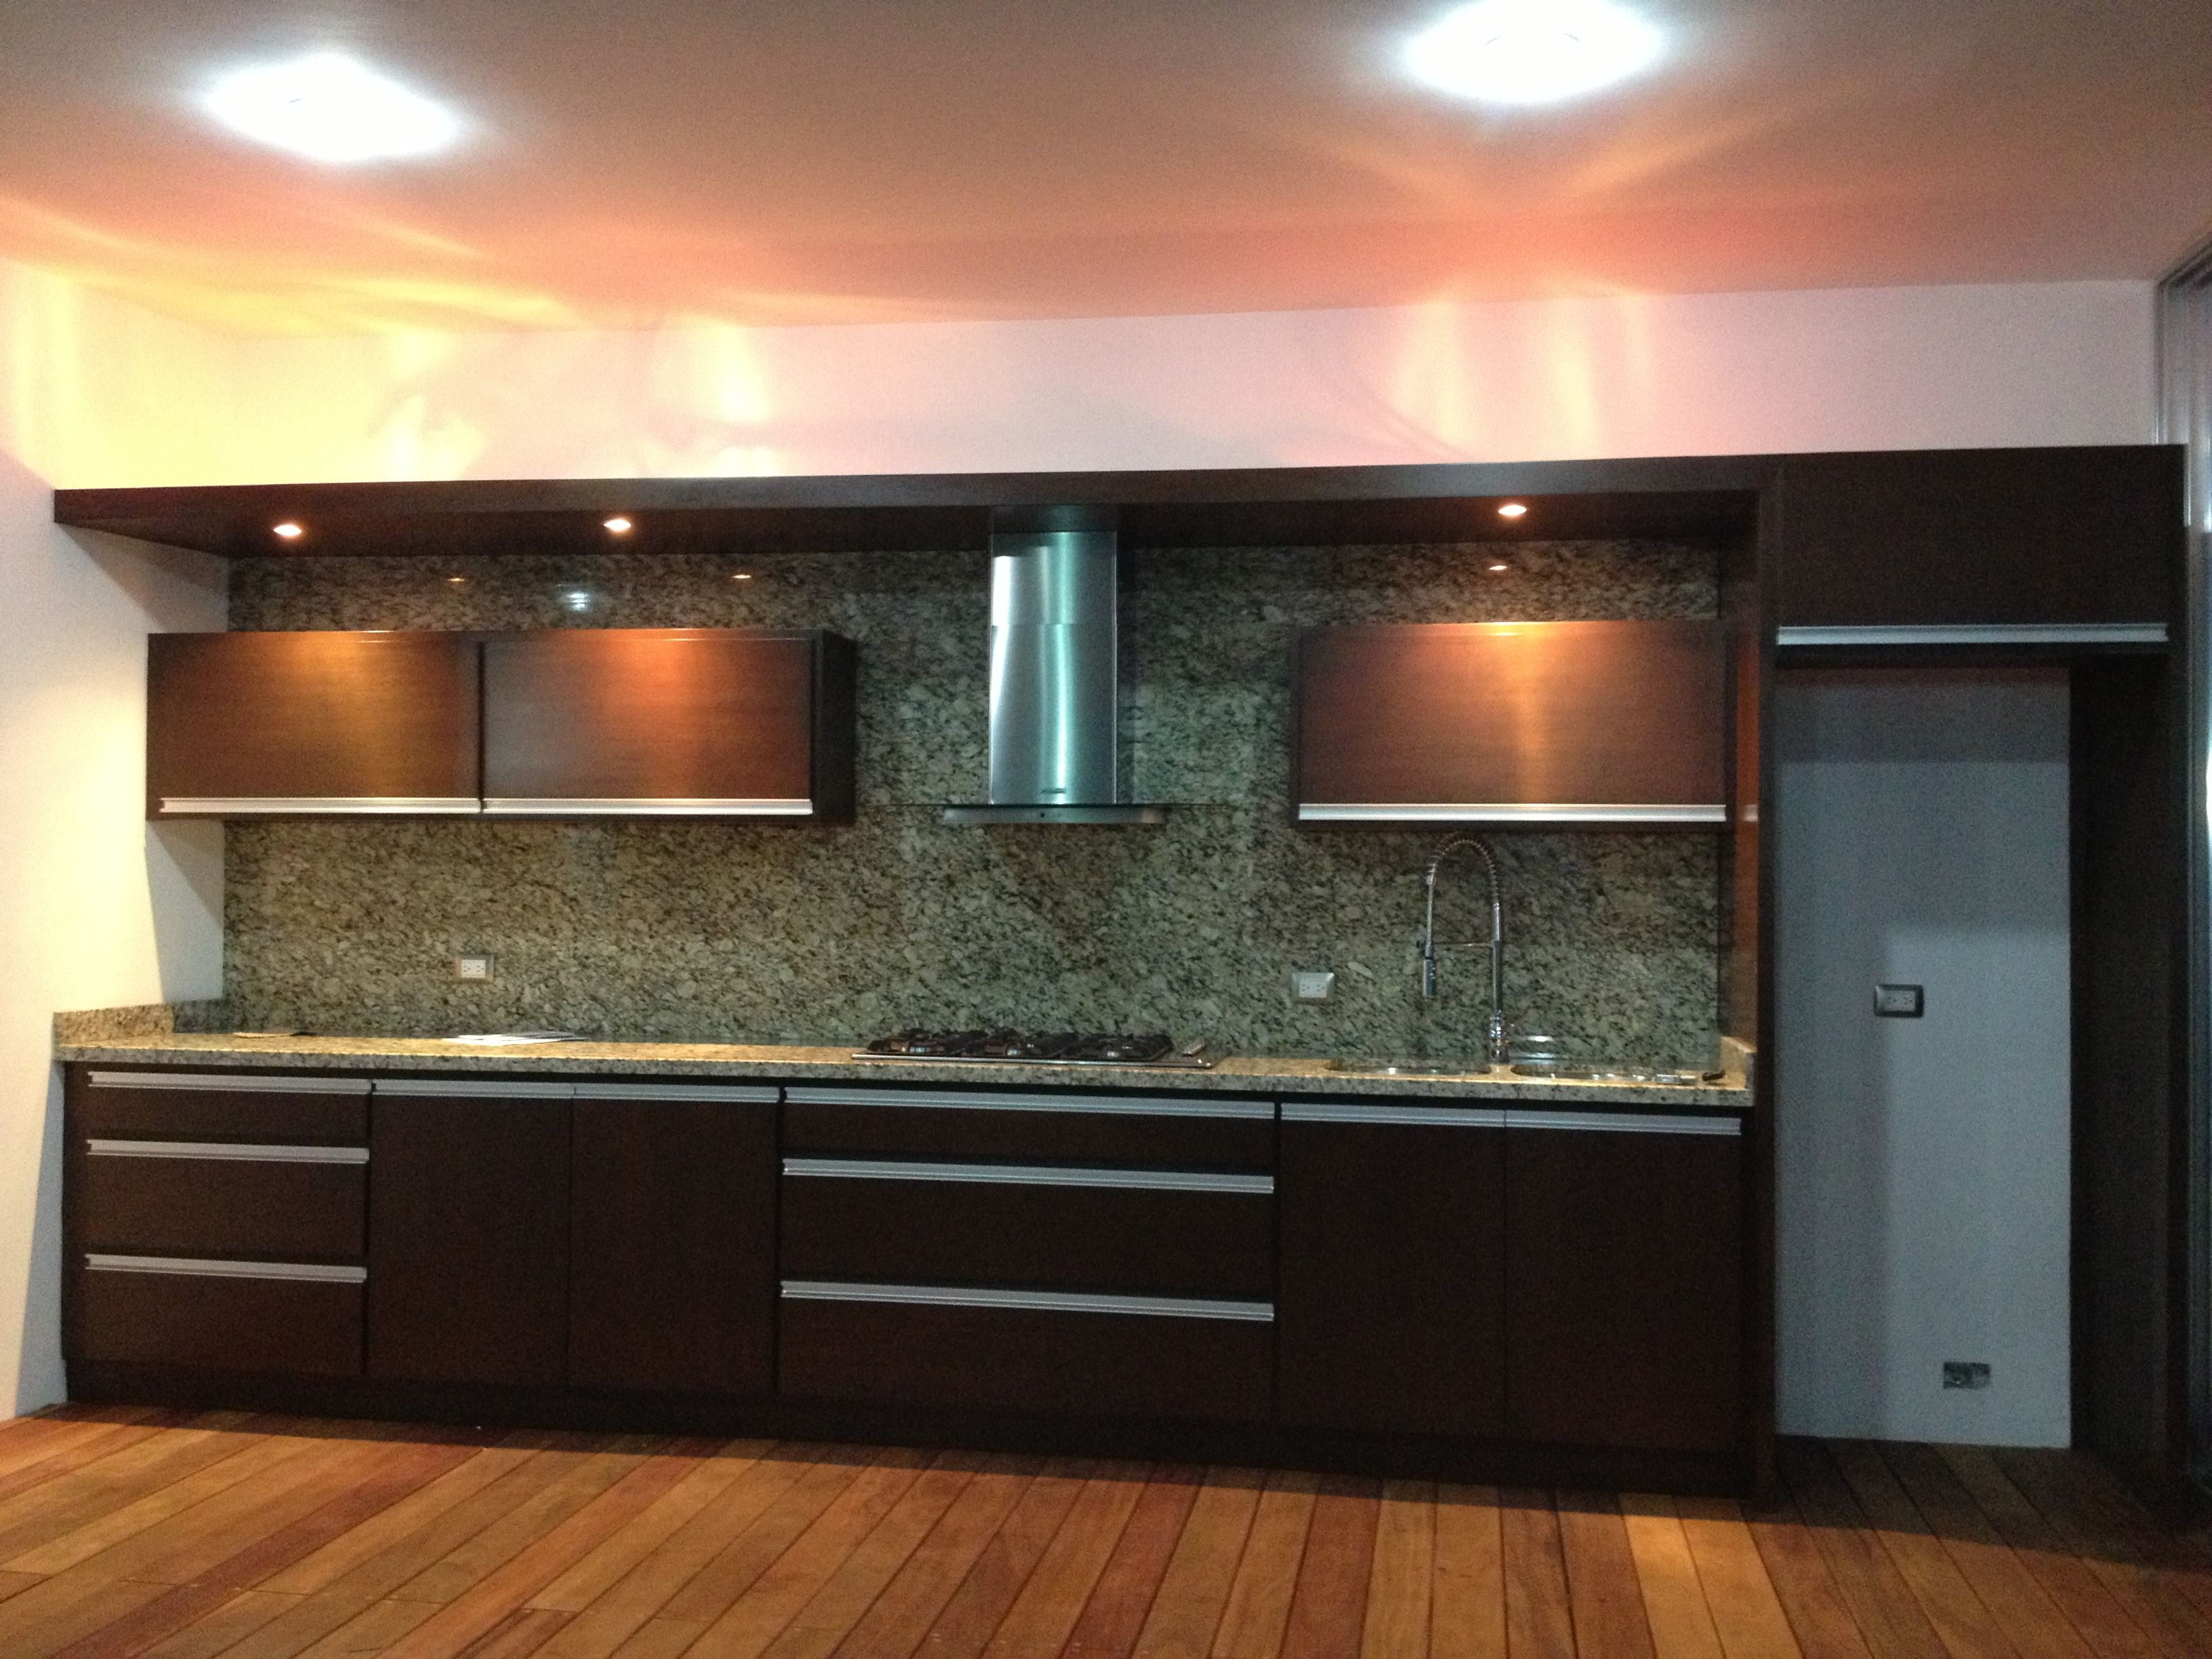 Cocina en cedro con aplicaciones de aluminio piso con for Pisos para cocina